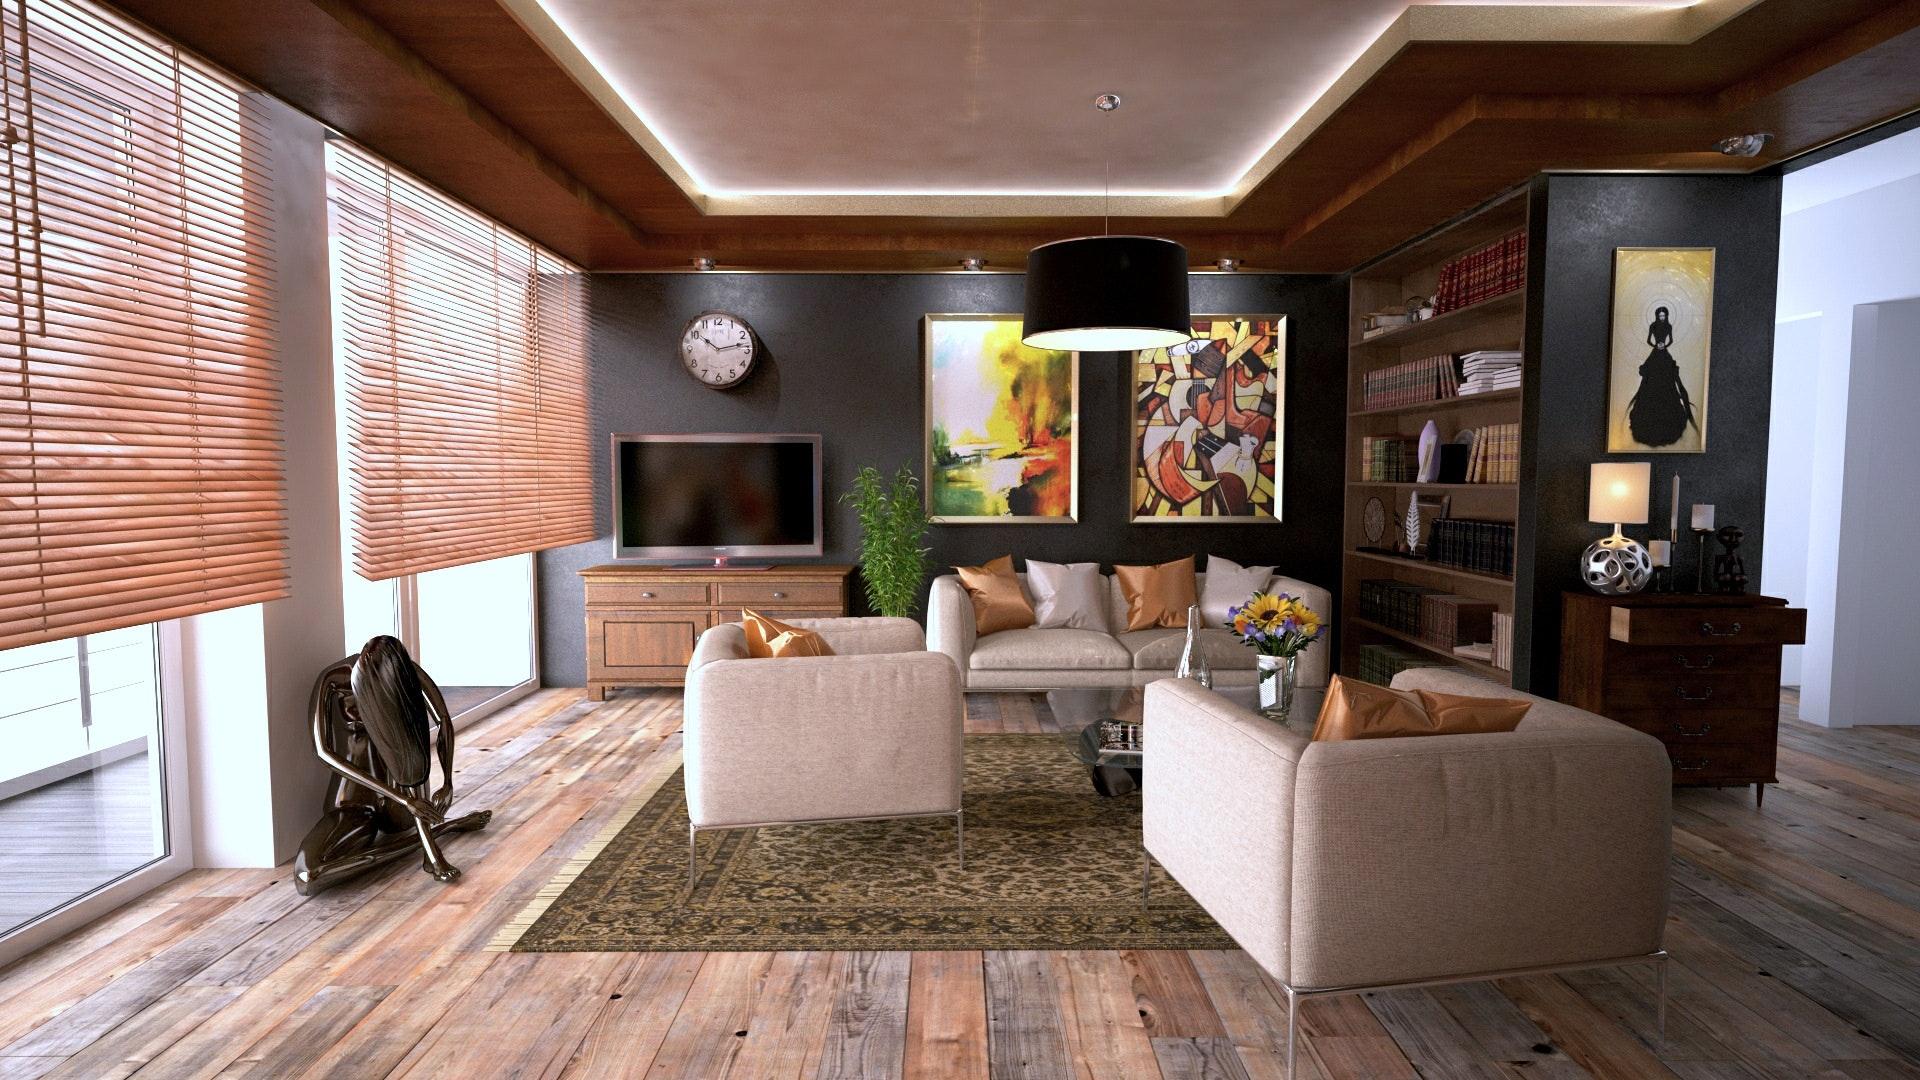 To acquire Designer Interior desktop wallpaper picture trends